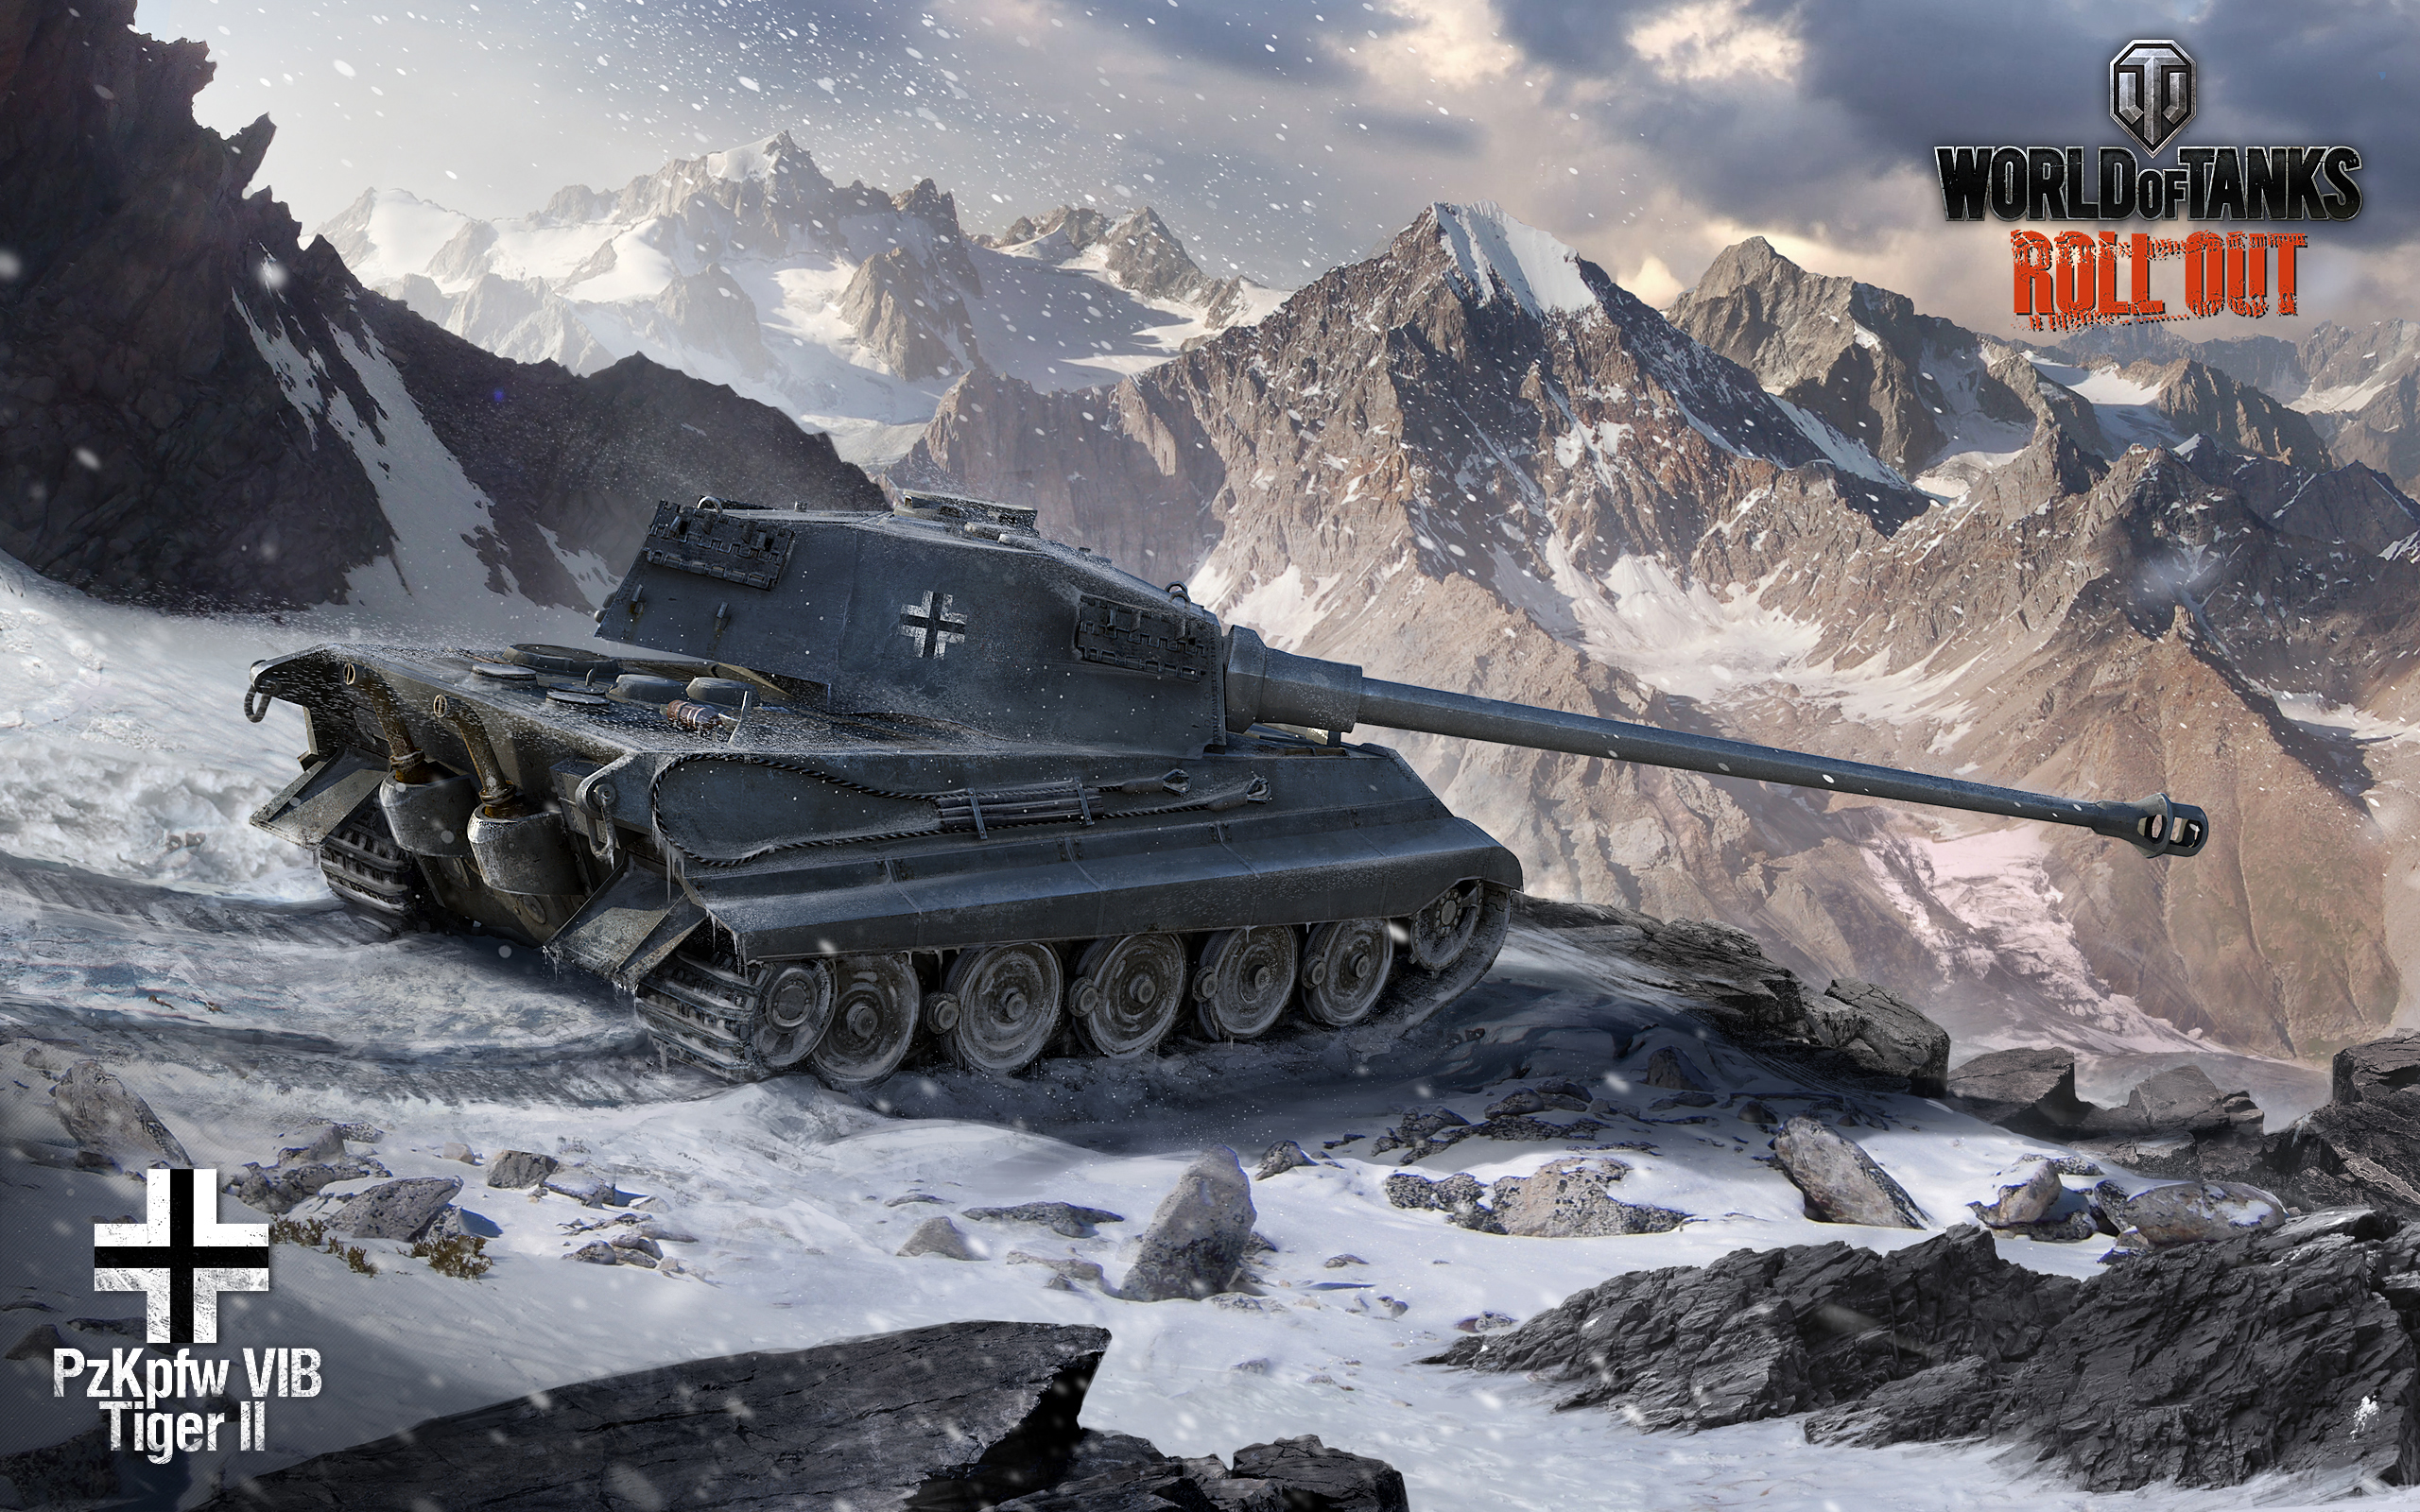 December Wallpaper | General News | World of Tanks